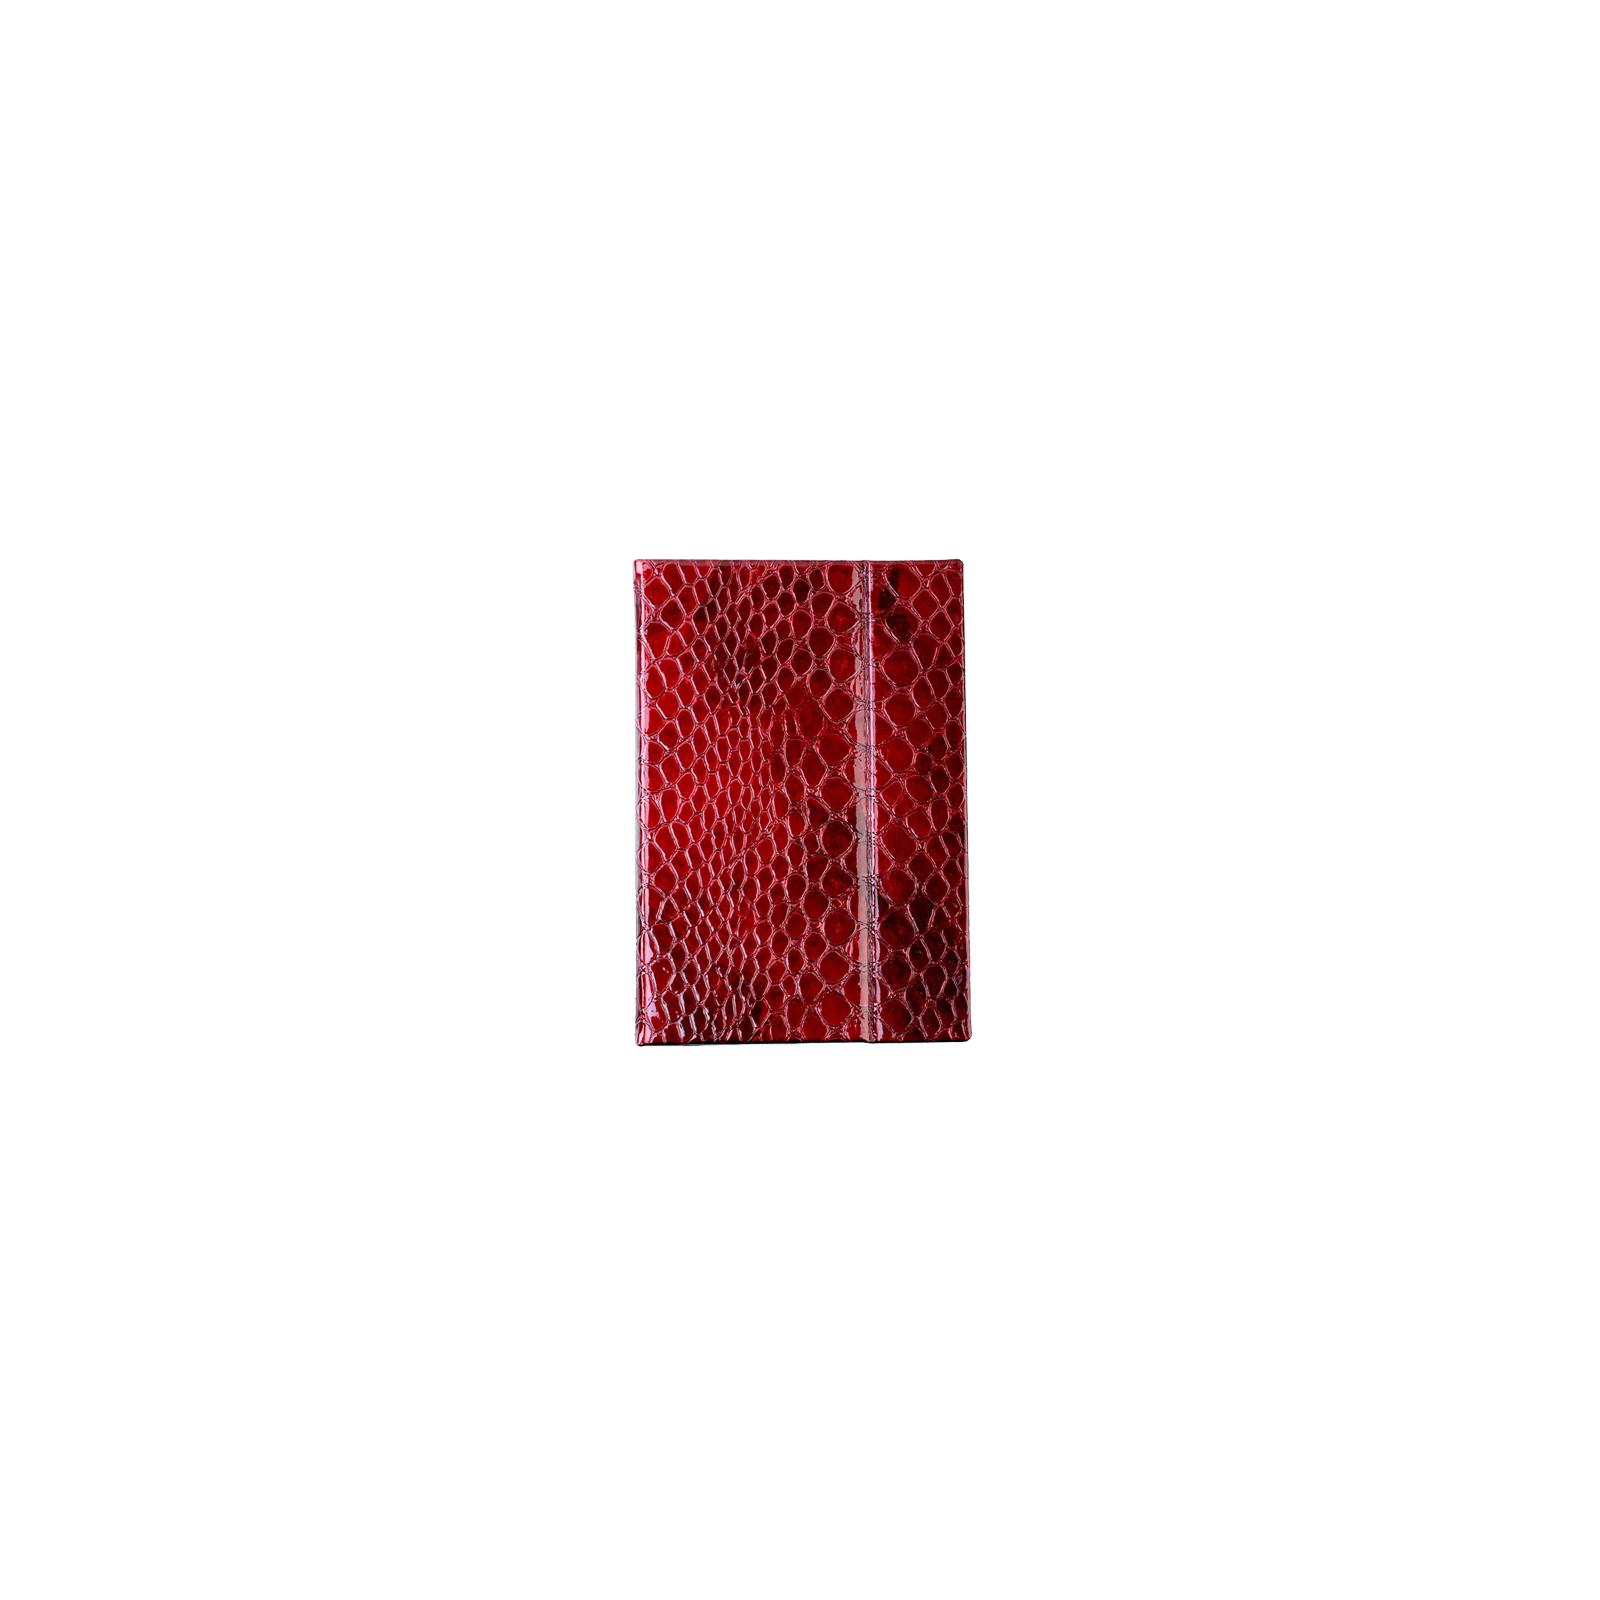 Чехол для планшета Vento 9.7 Desire glossy - red reptile изображение 2